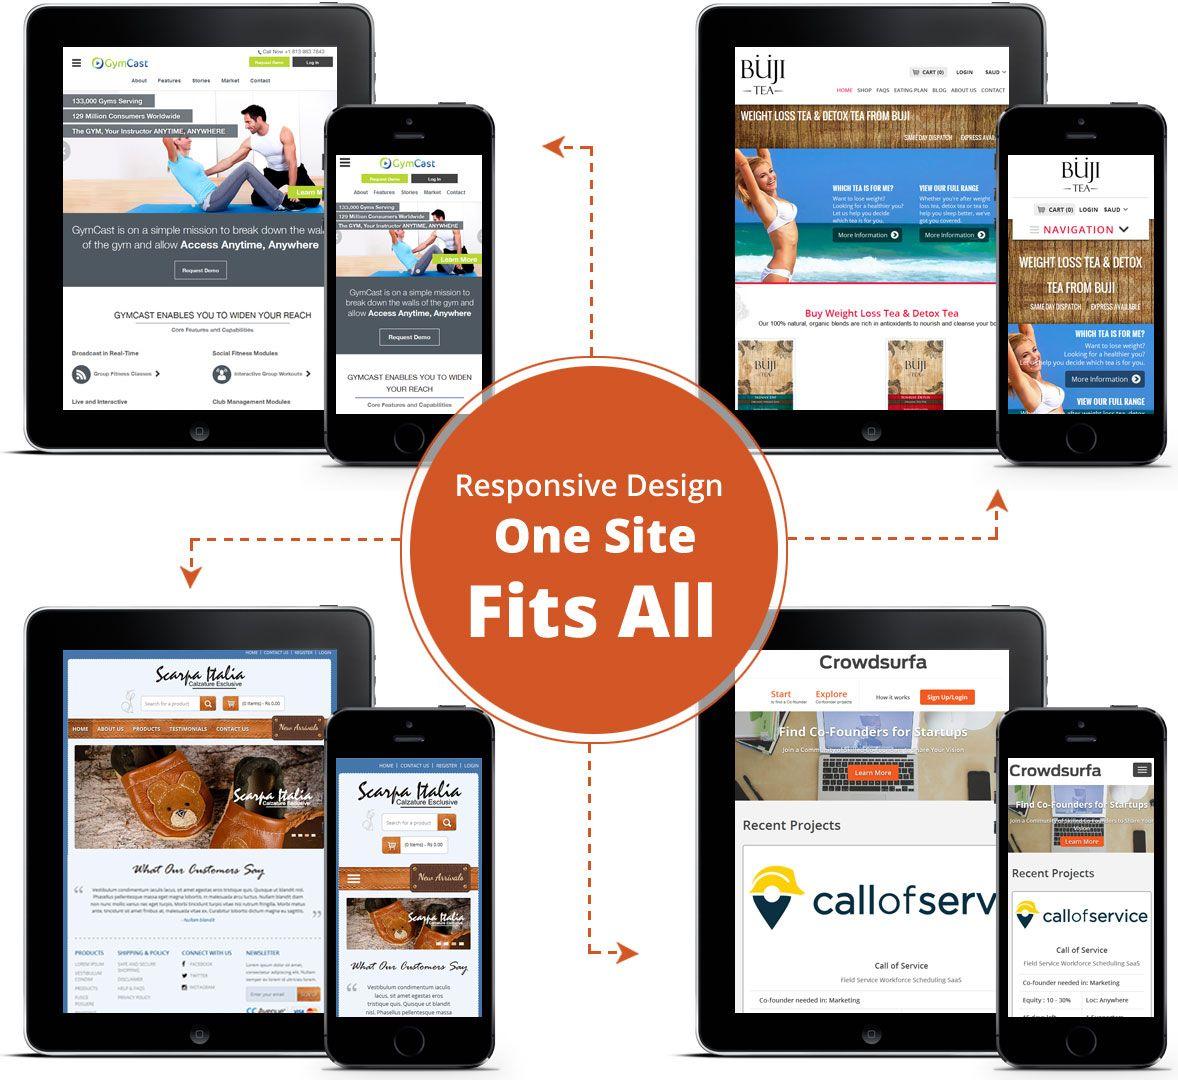 Web Design City Is A Professional Website Design Company In Sydney Australia Offer Best Website Desi Web Design Professional Website Design Fun Website Design